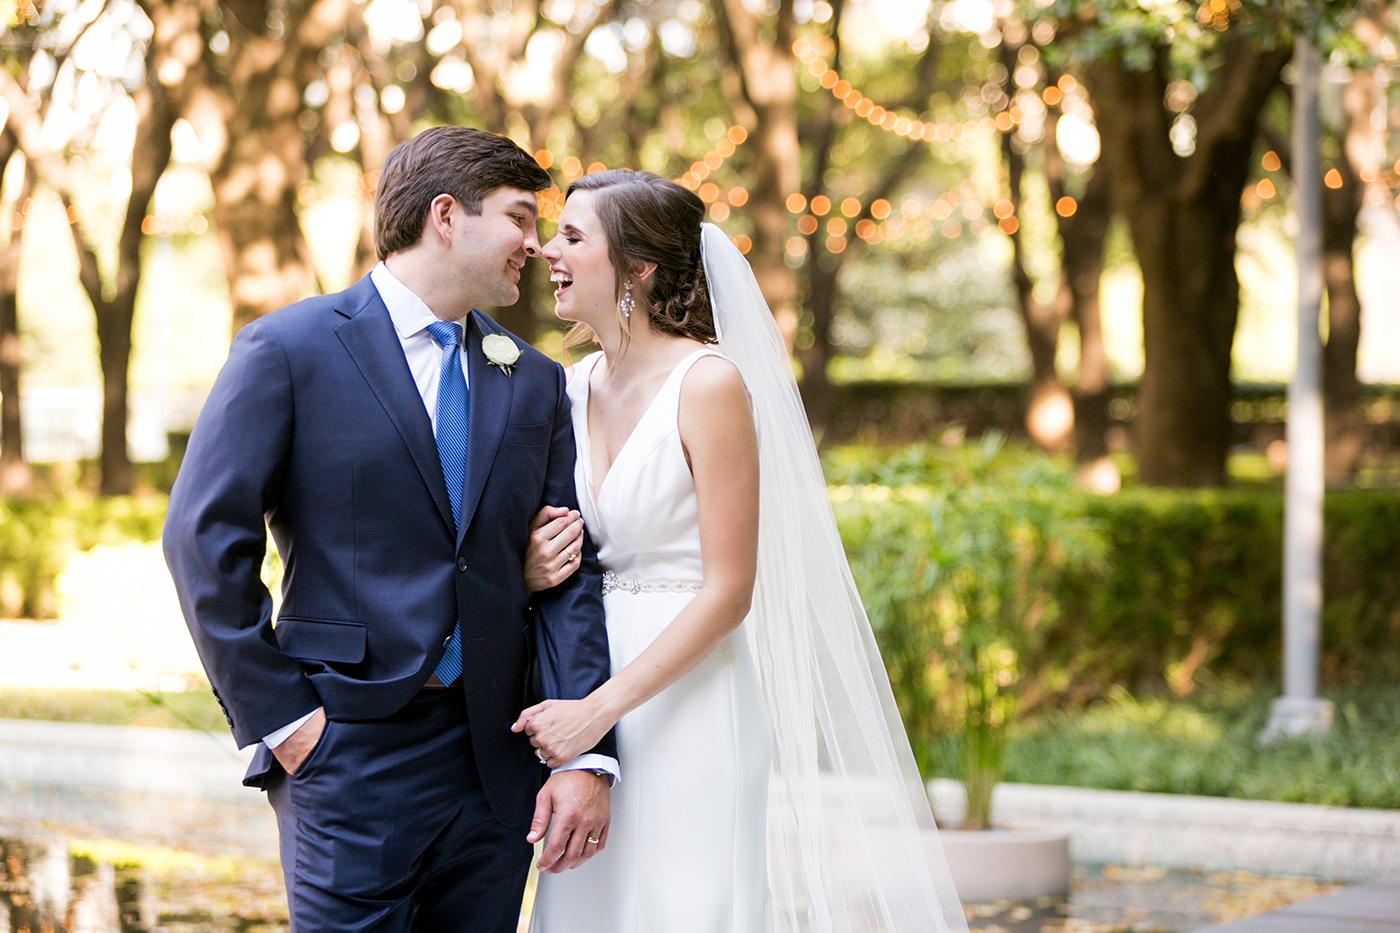 Wedding Planner Dallas TX - Allday Events - Highland Park - Marie Gabrielle Wedding - 273.jpg